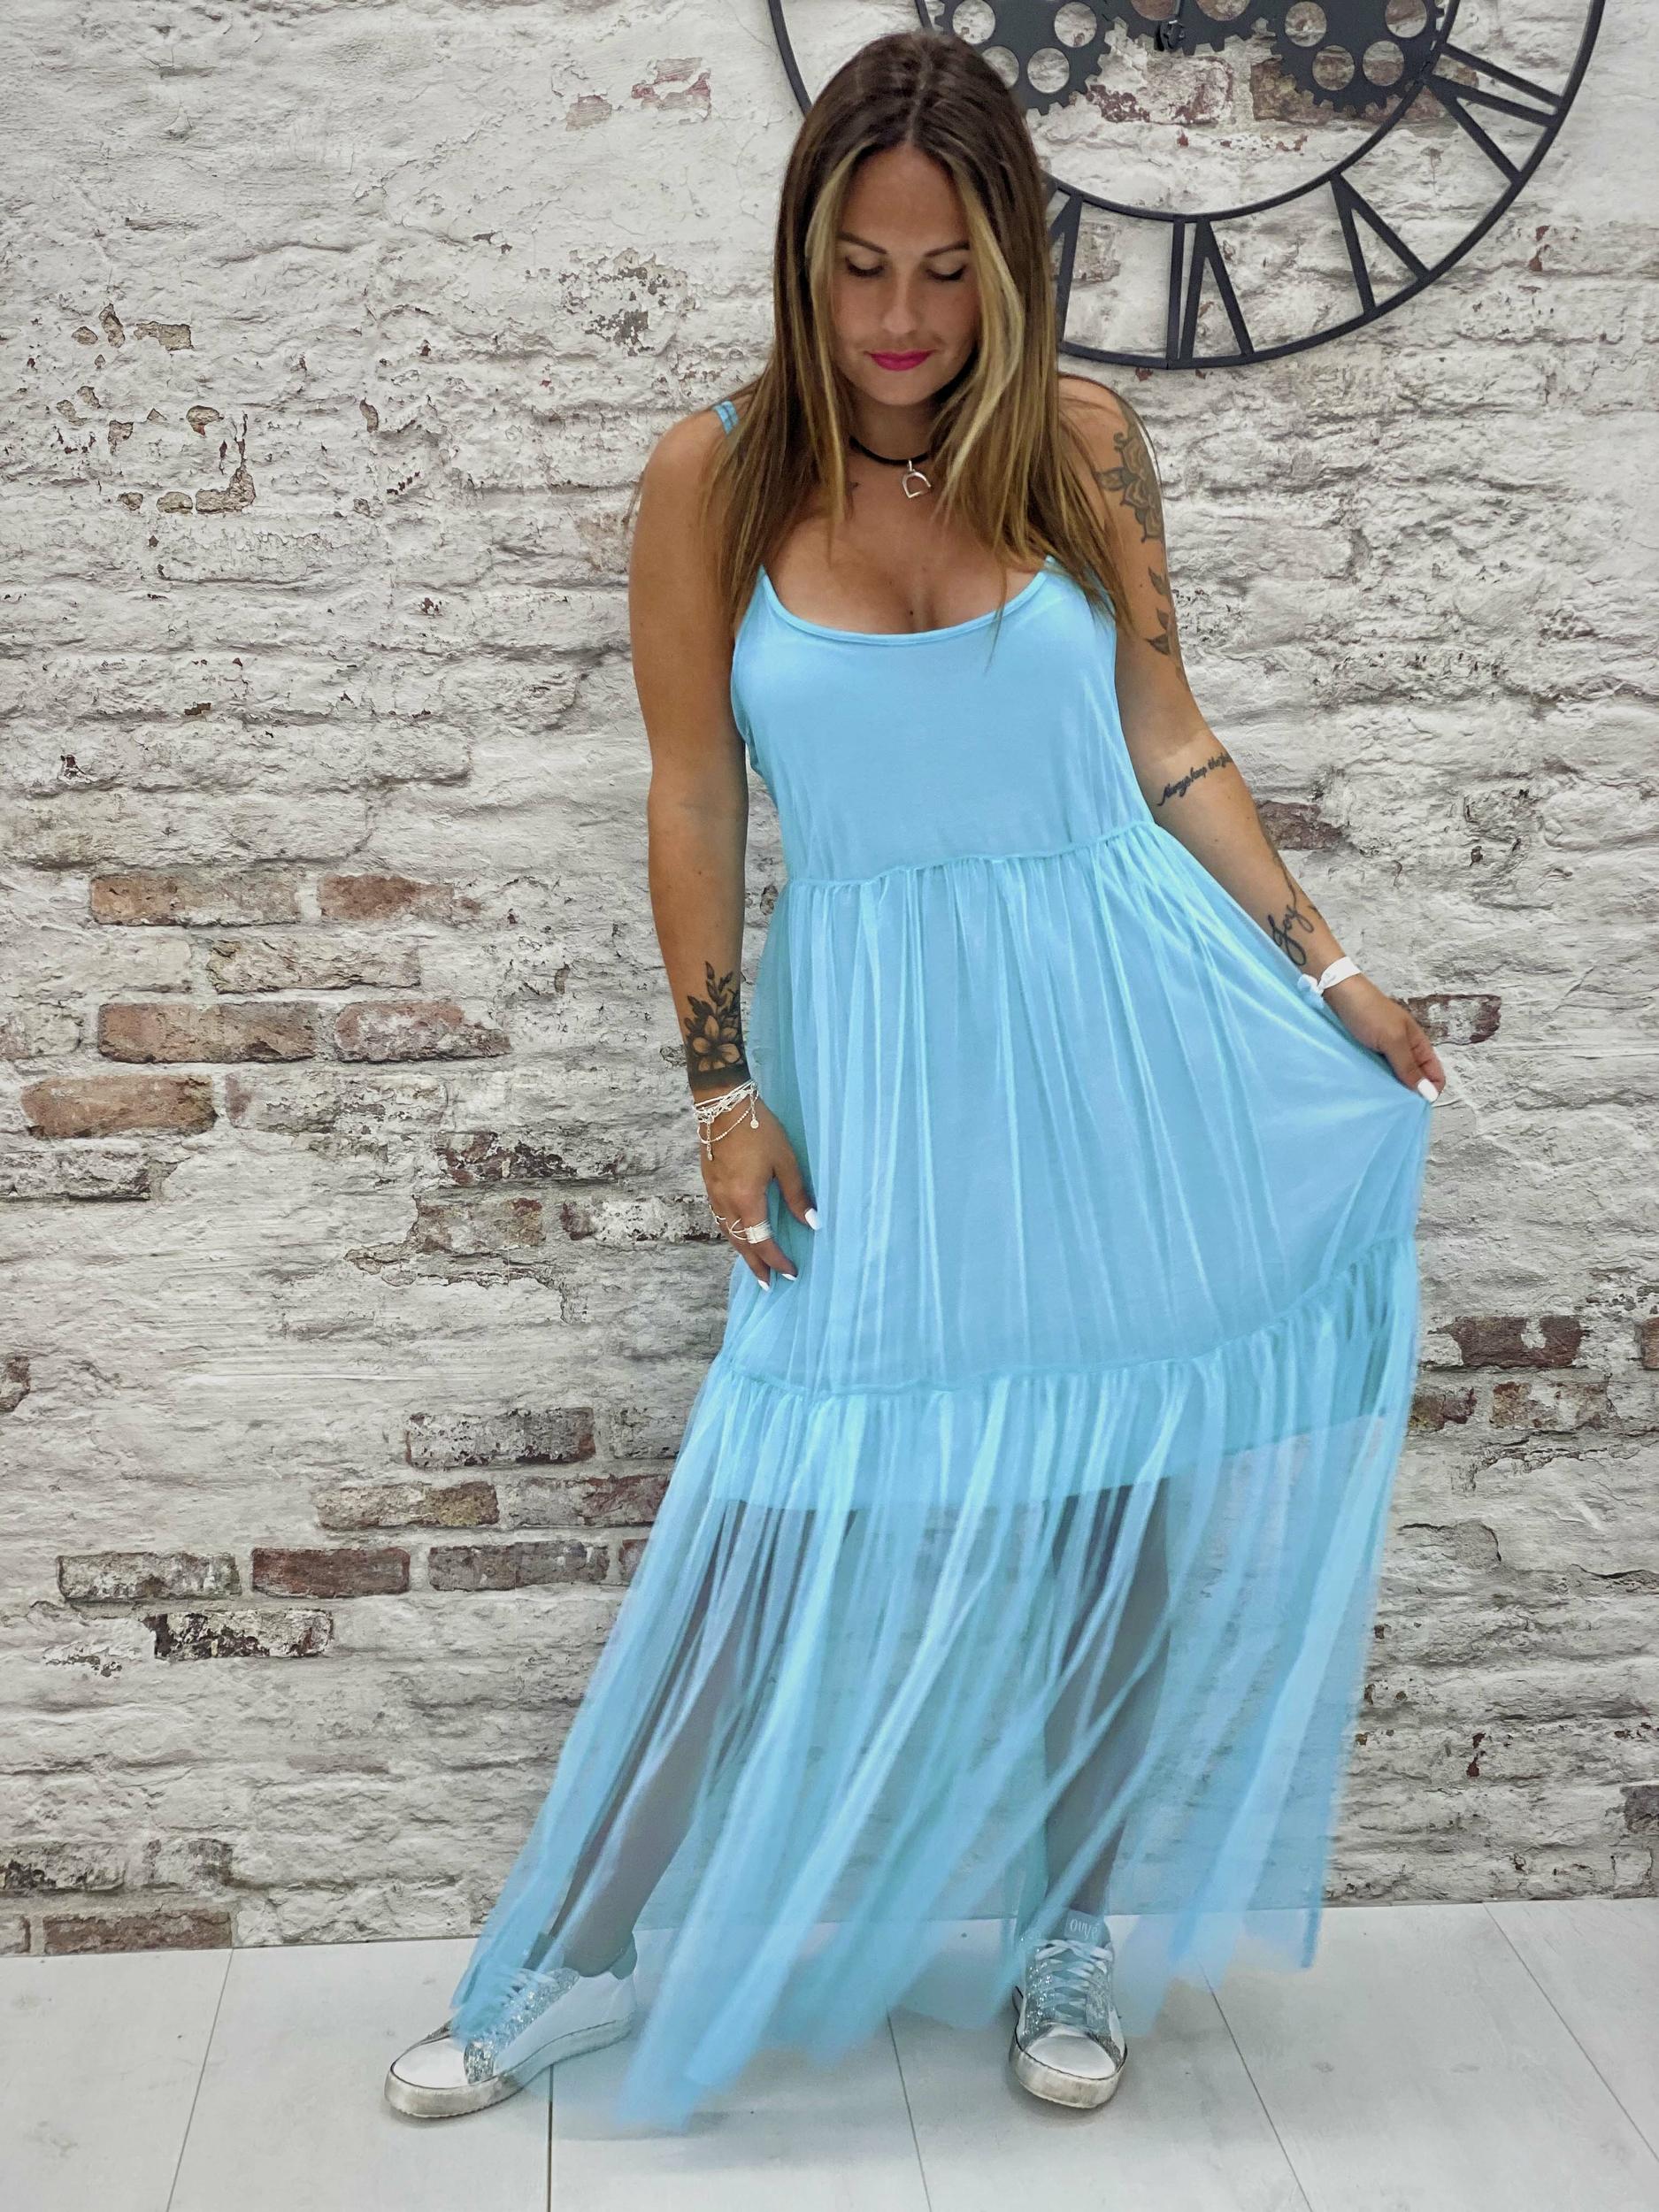 carlotta_turquoise_wiya-4